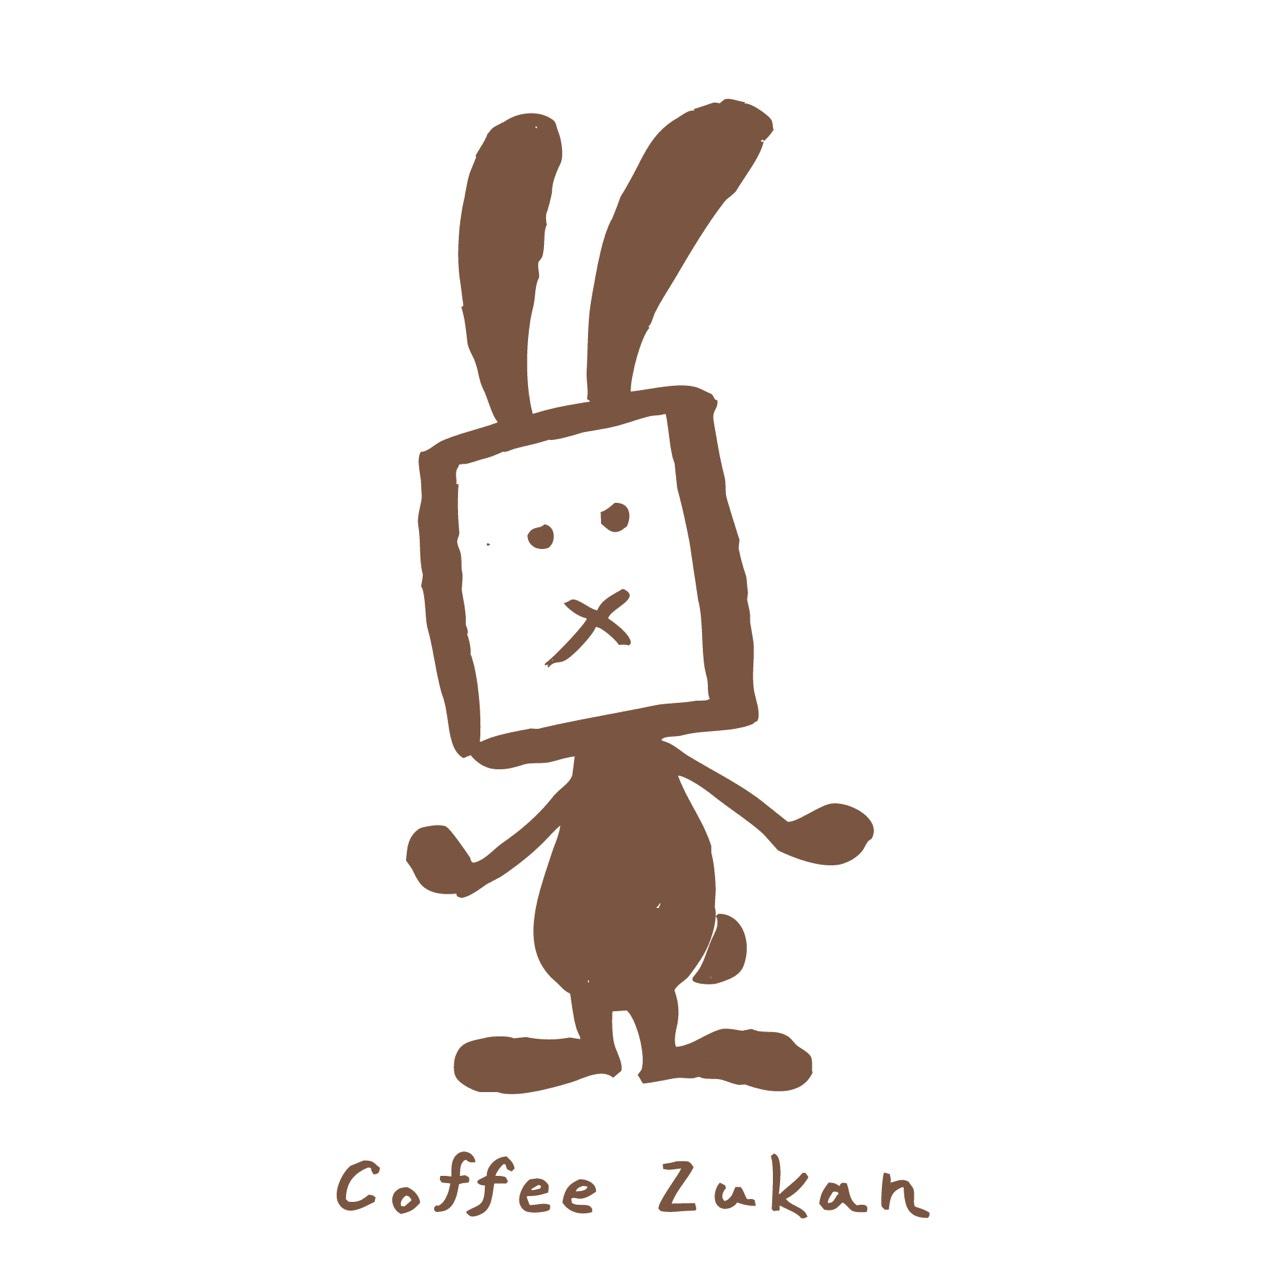 Coffee Zukanのマスコット、クレマ君(仮)